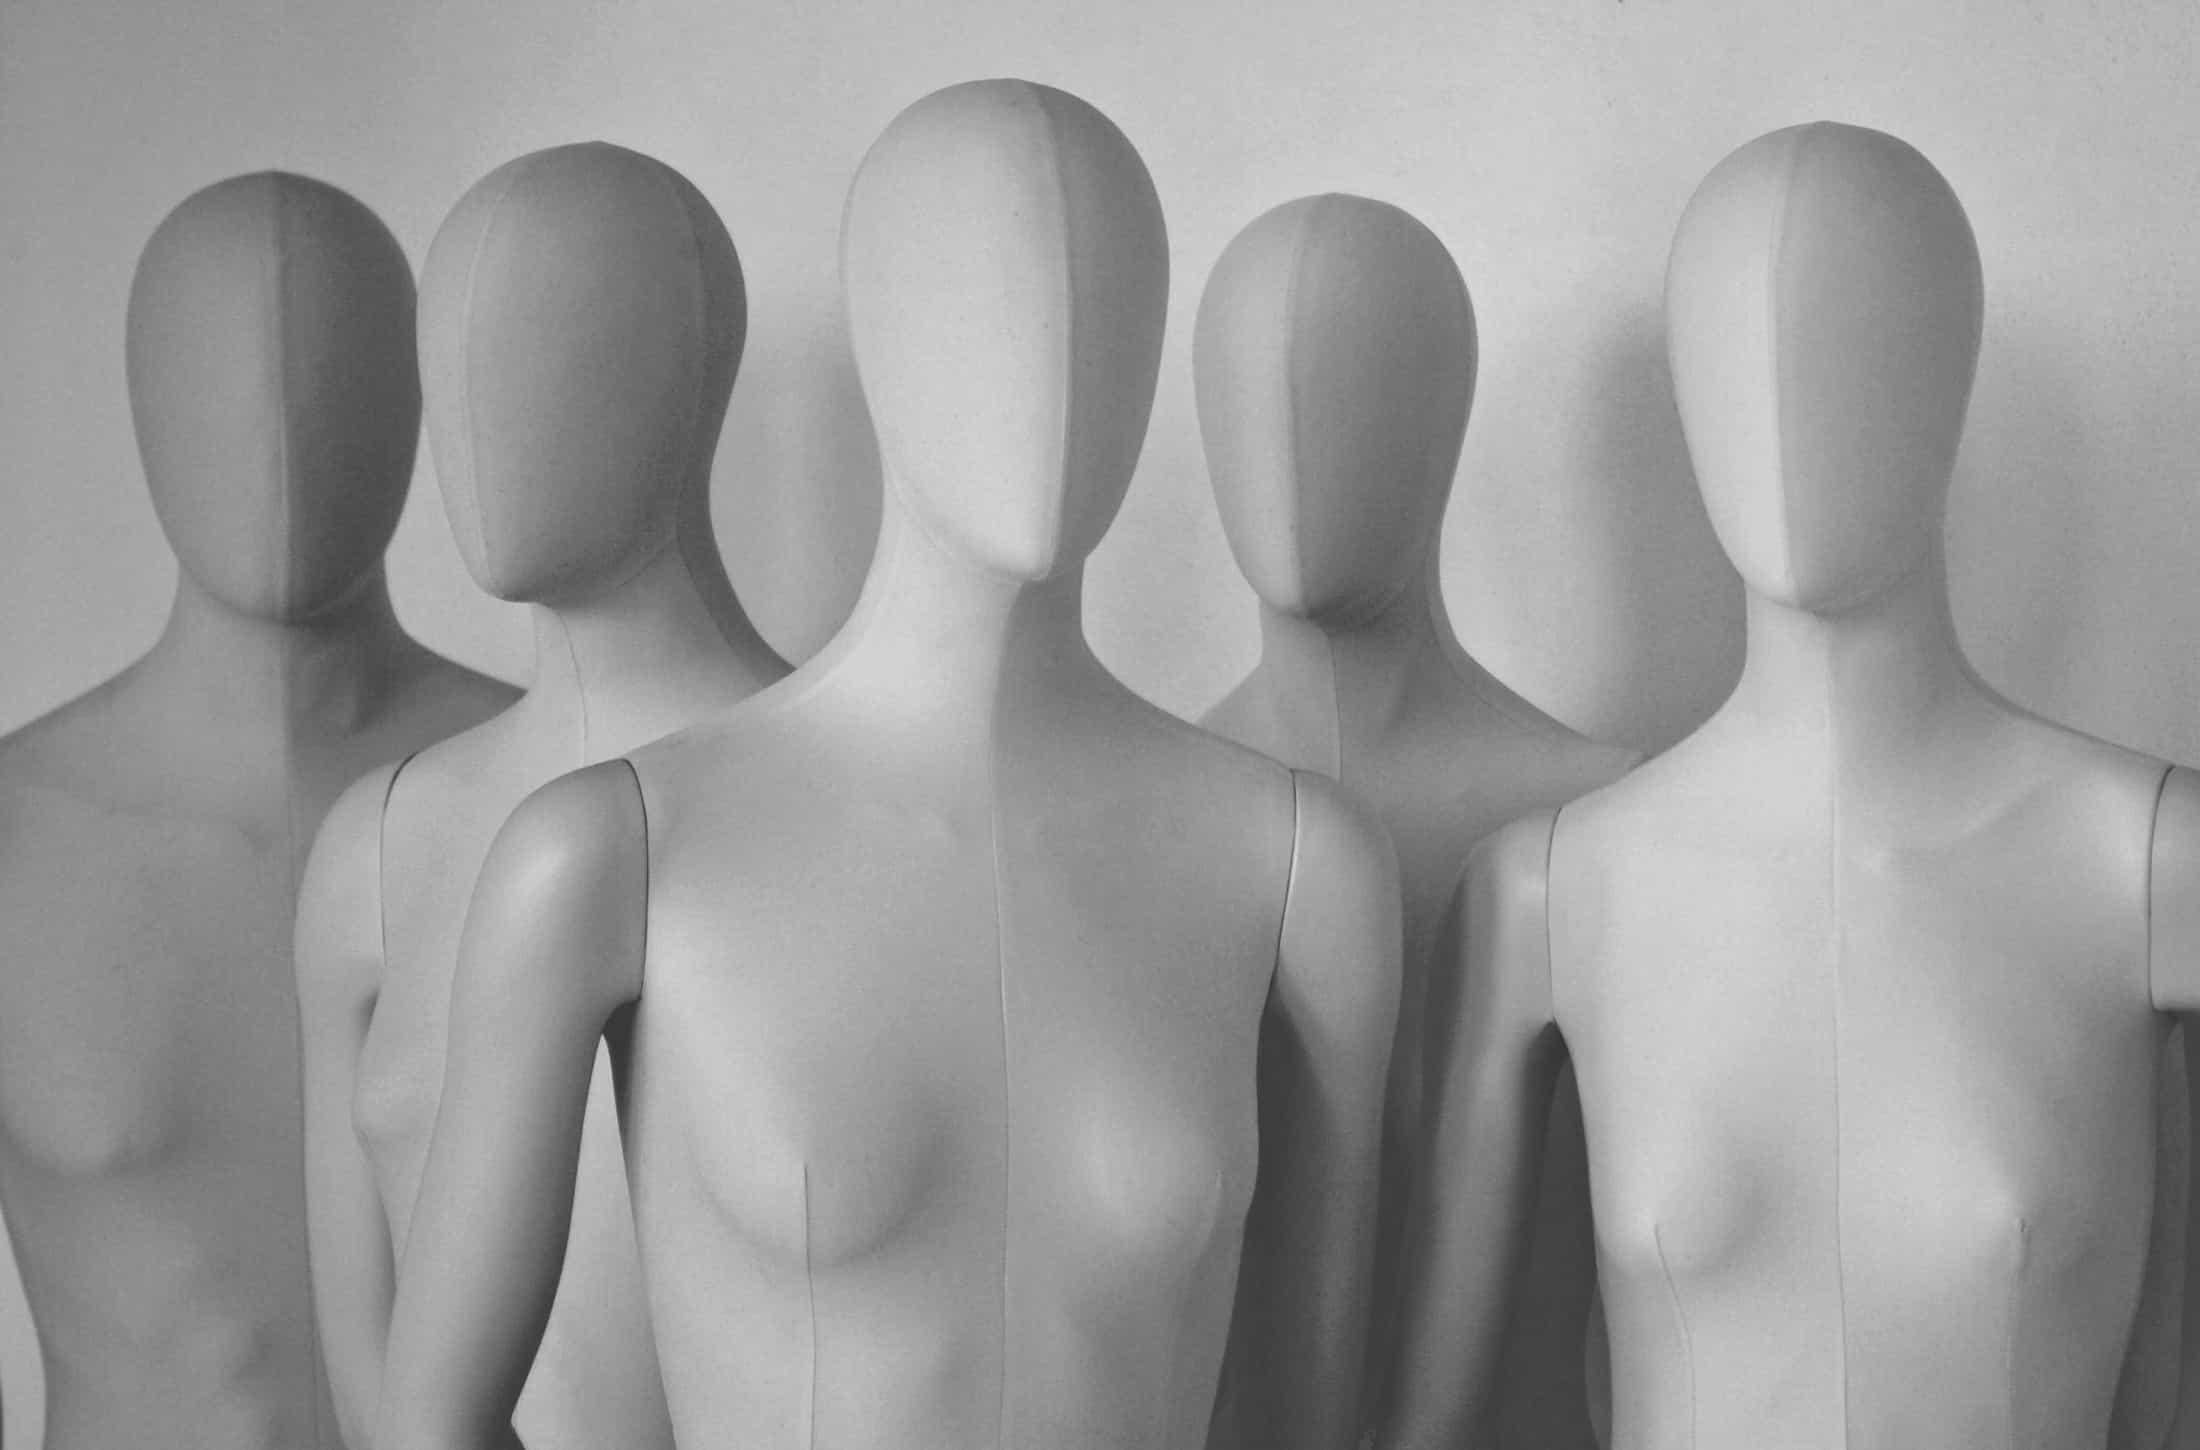 bonaveri fashion model mannequin collection 01